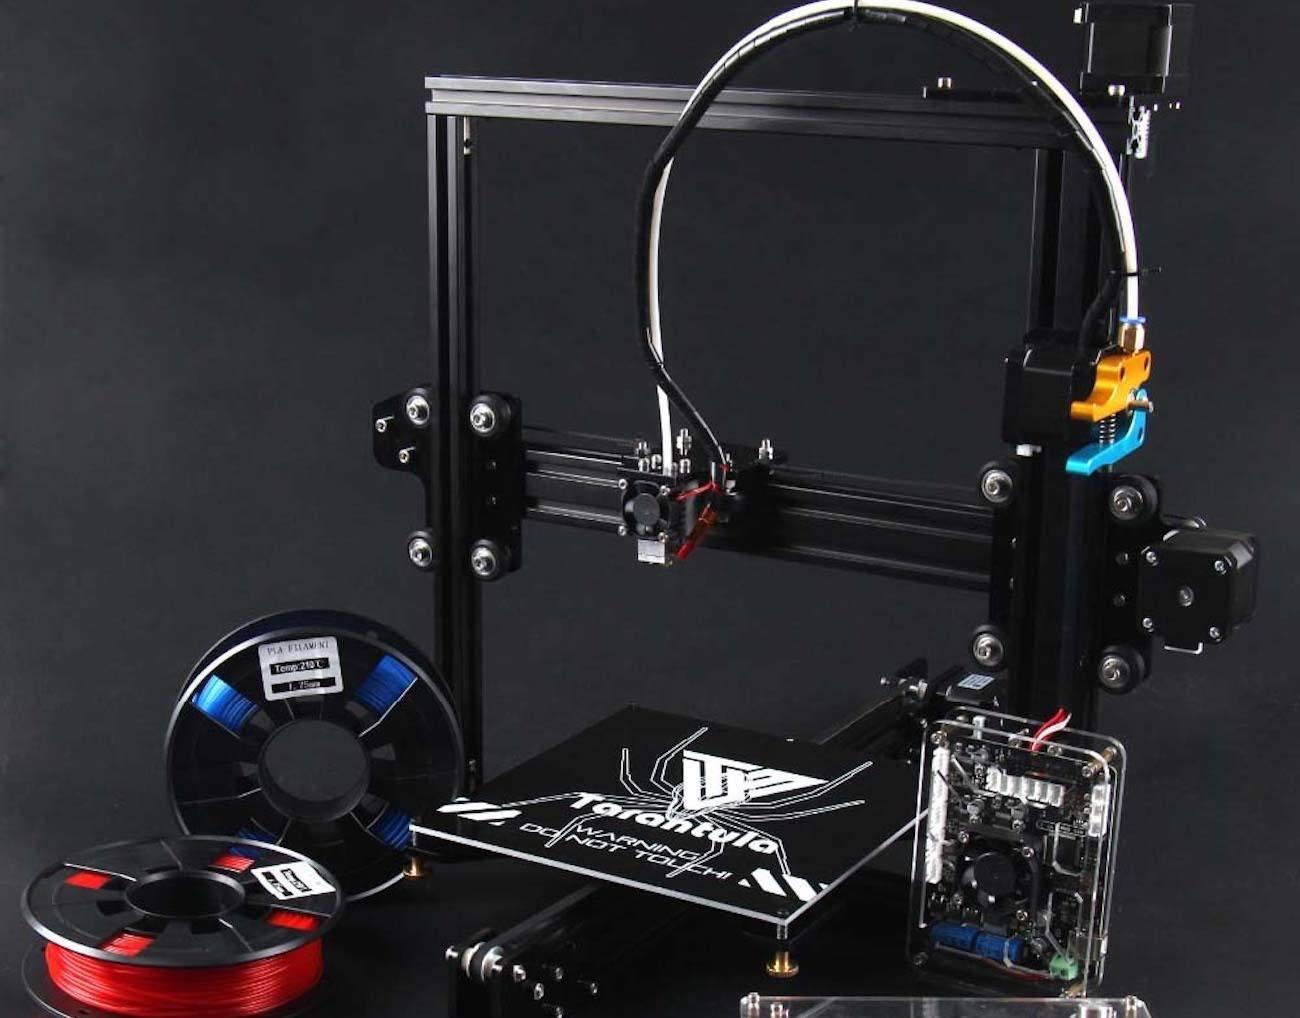 TEVO Tarantula I3 3D Printer Kit